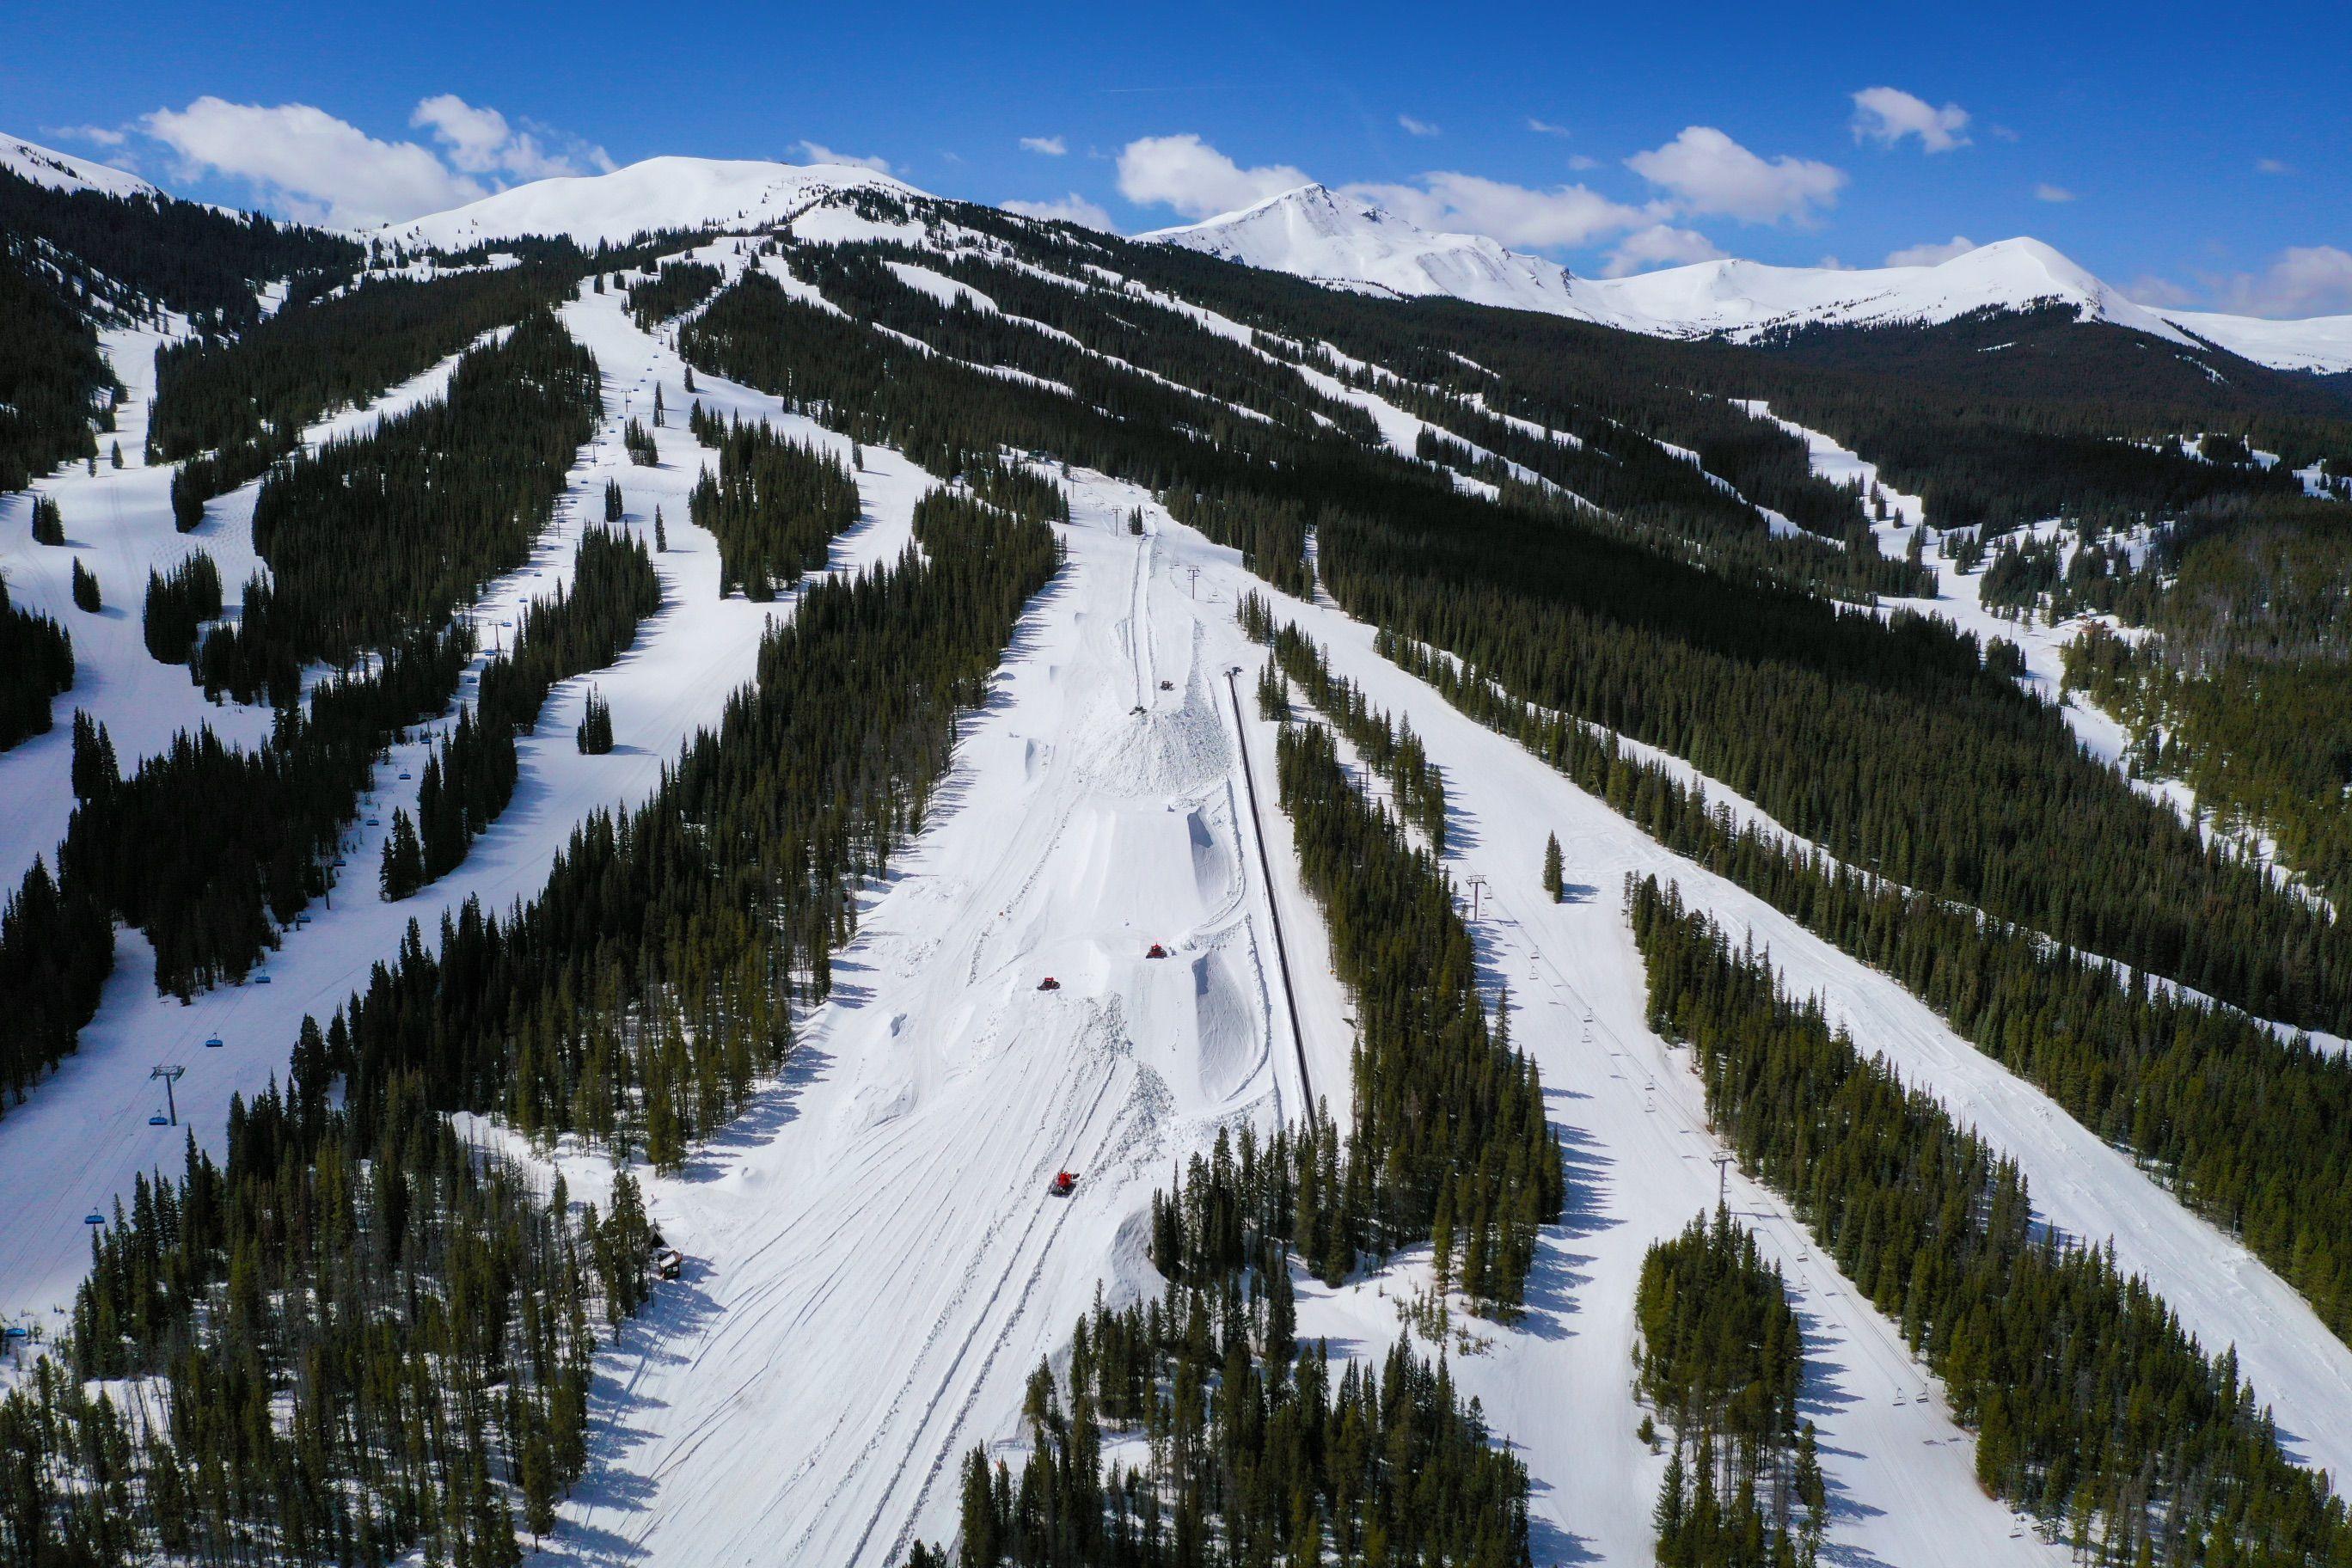 Copper Mountain 2019 2020 Season Passes Are On Sale Now Colorado